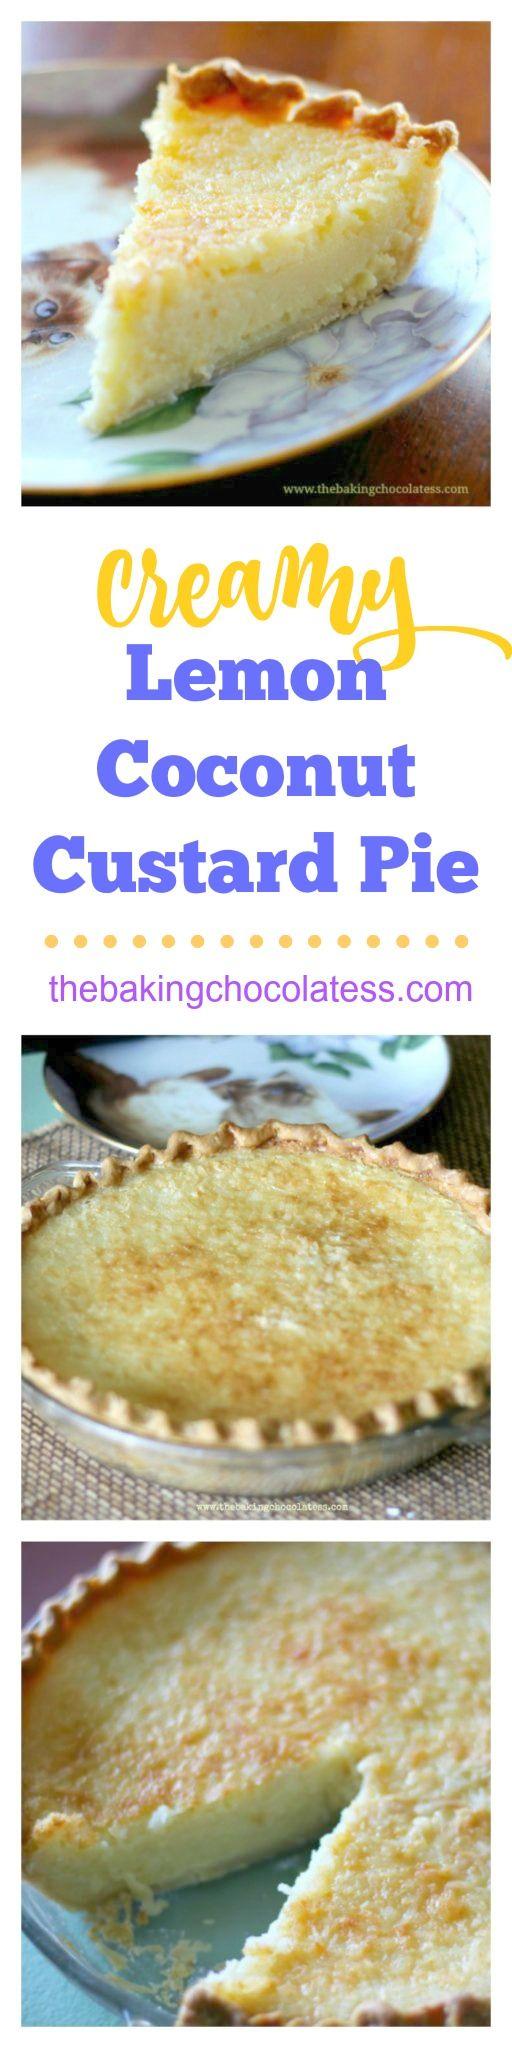 Creamy Lemon Coconut Custard Pie via @https://www.pinterest.com/BaknChocolaTess/